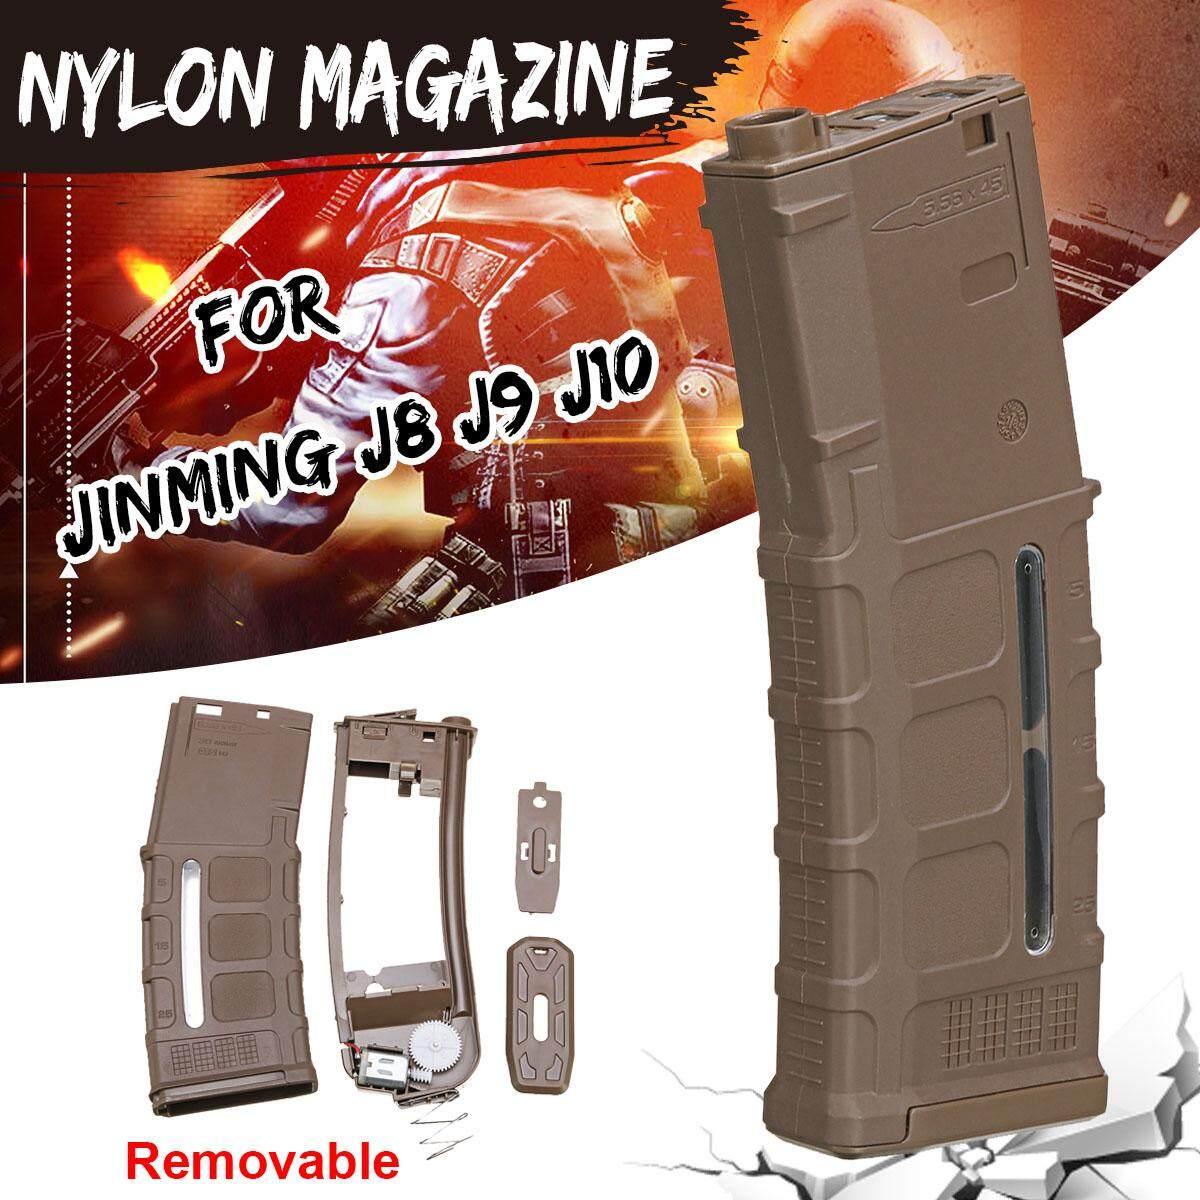 Upgrade Removable Nylon Magazine For Jinming Gen8 Gen9 Gen10 Gel Blaster Toy By Freebang.